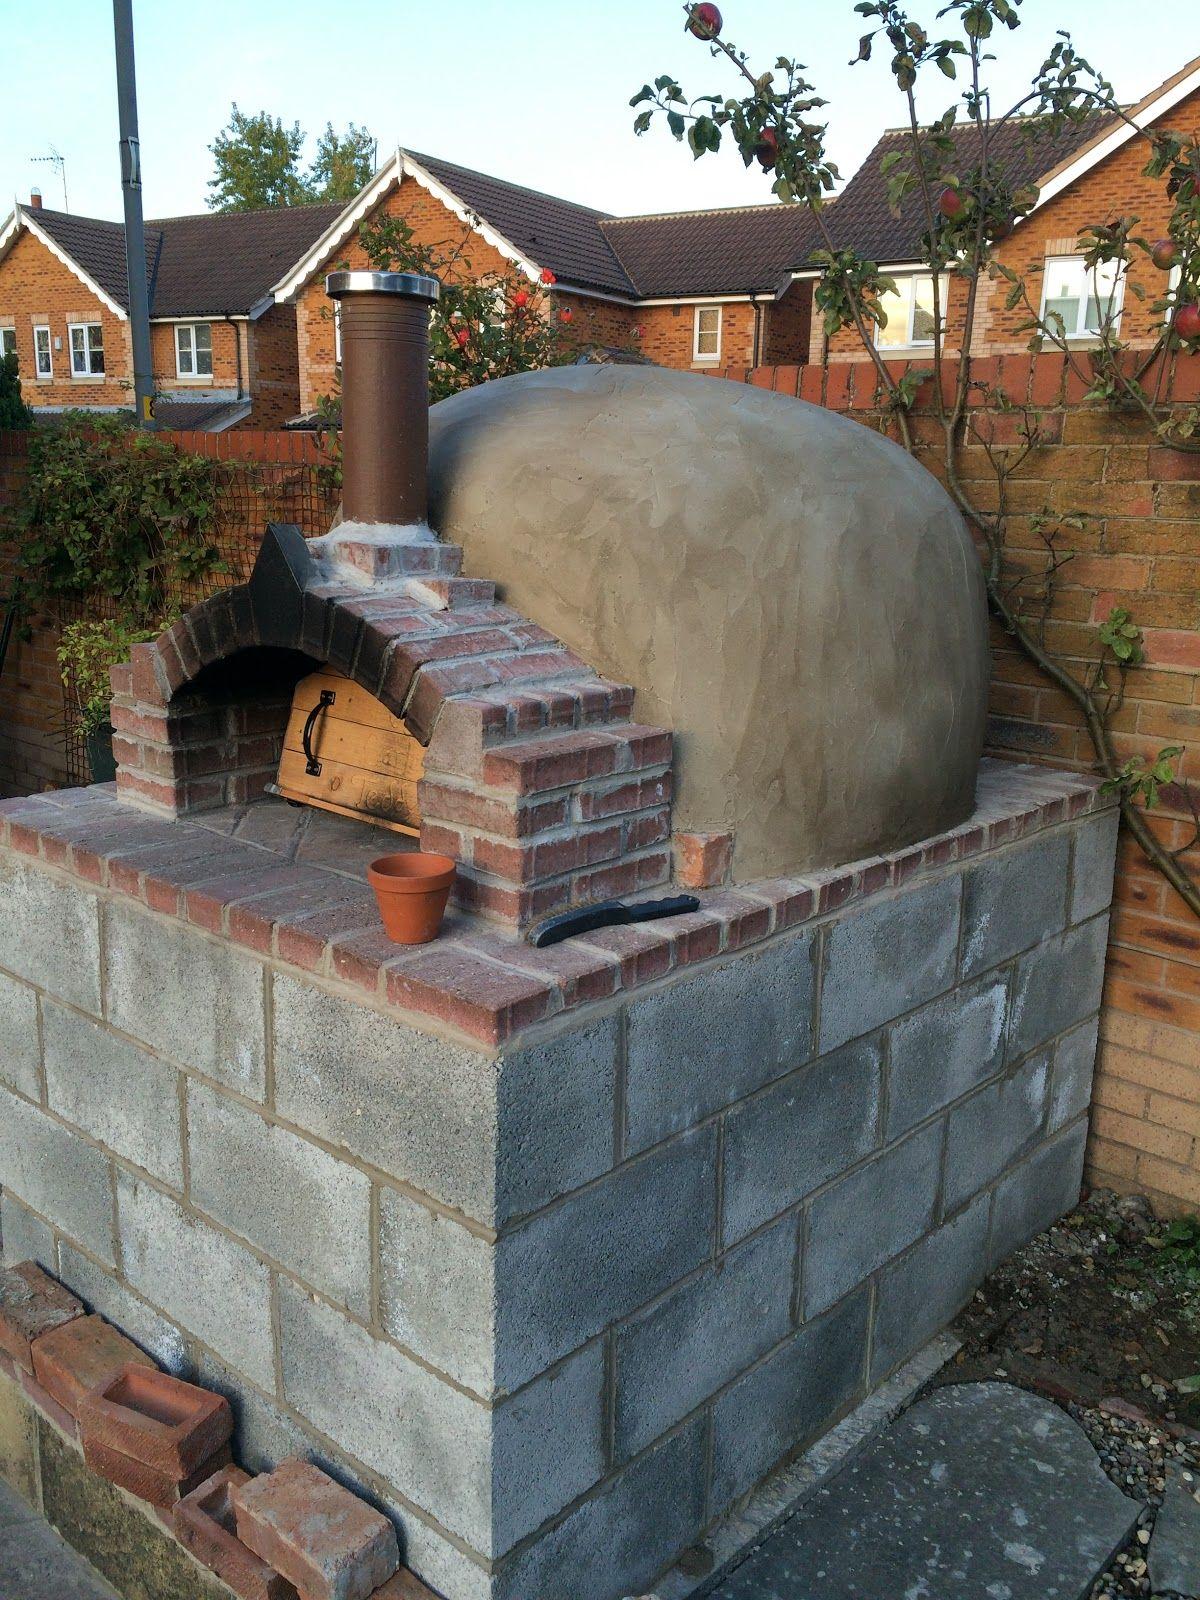 andys brick pizza oven - Brick Garden 2015